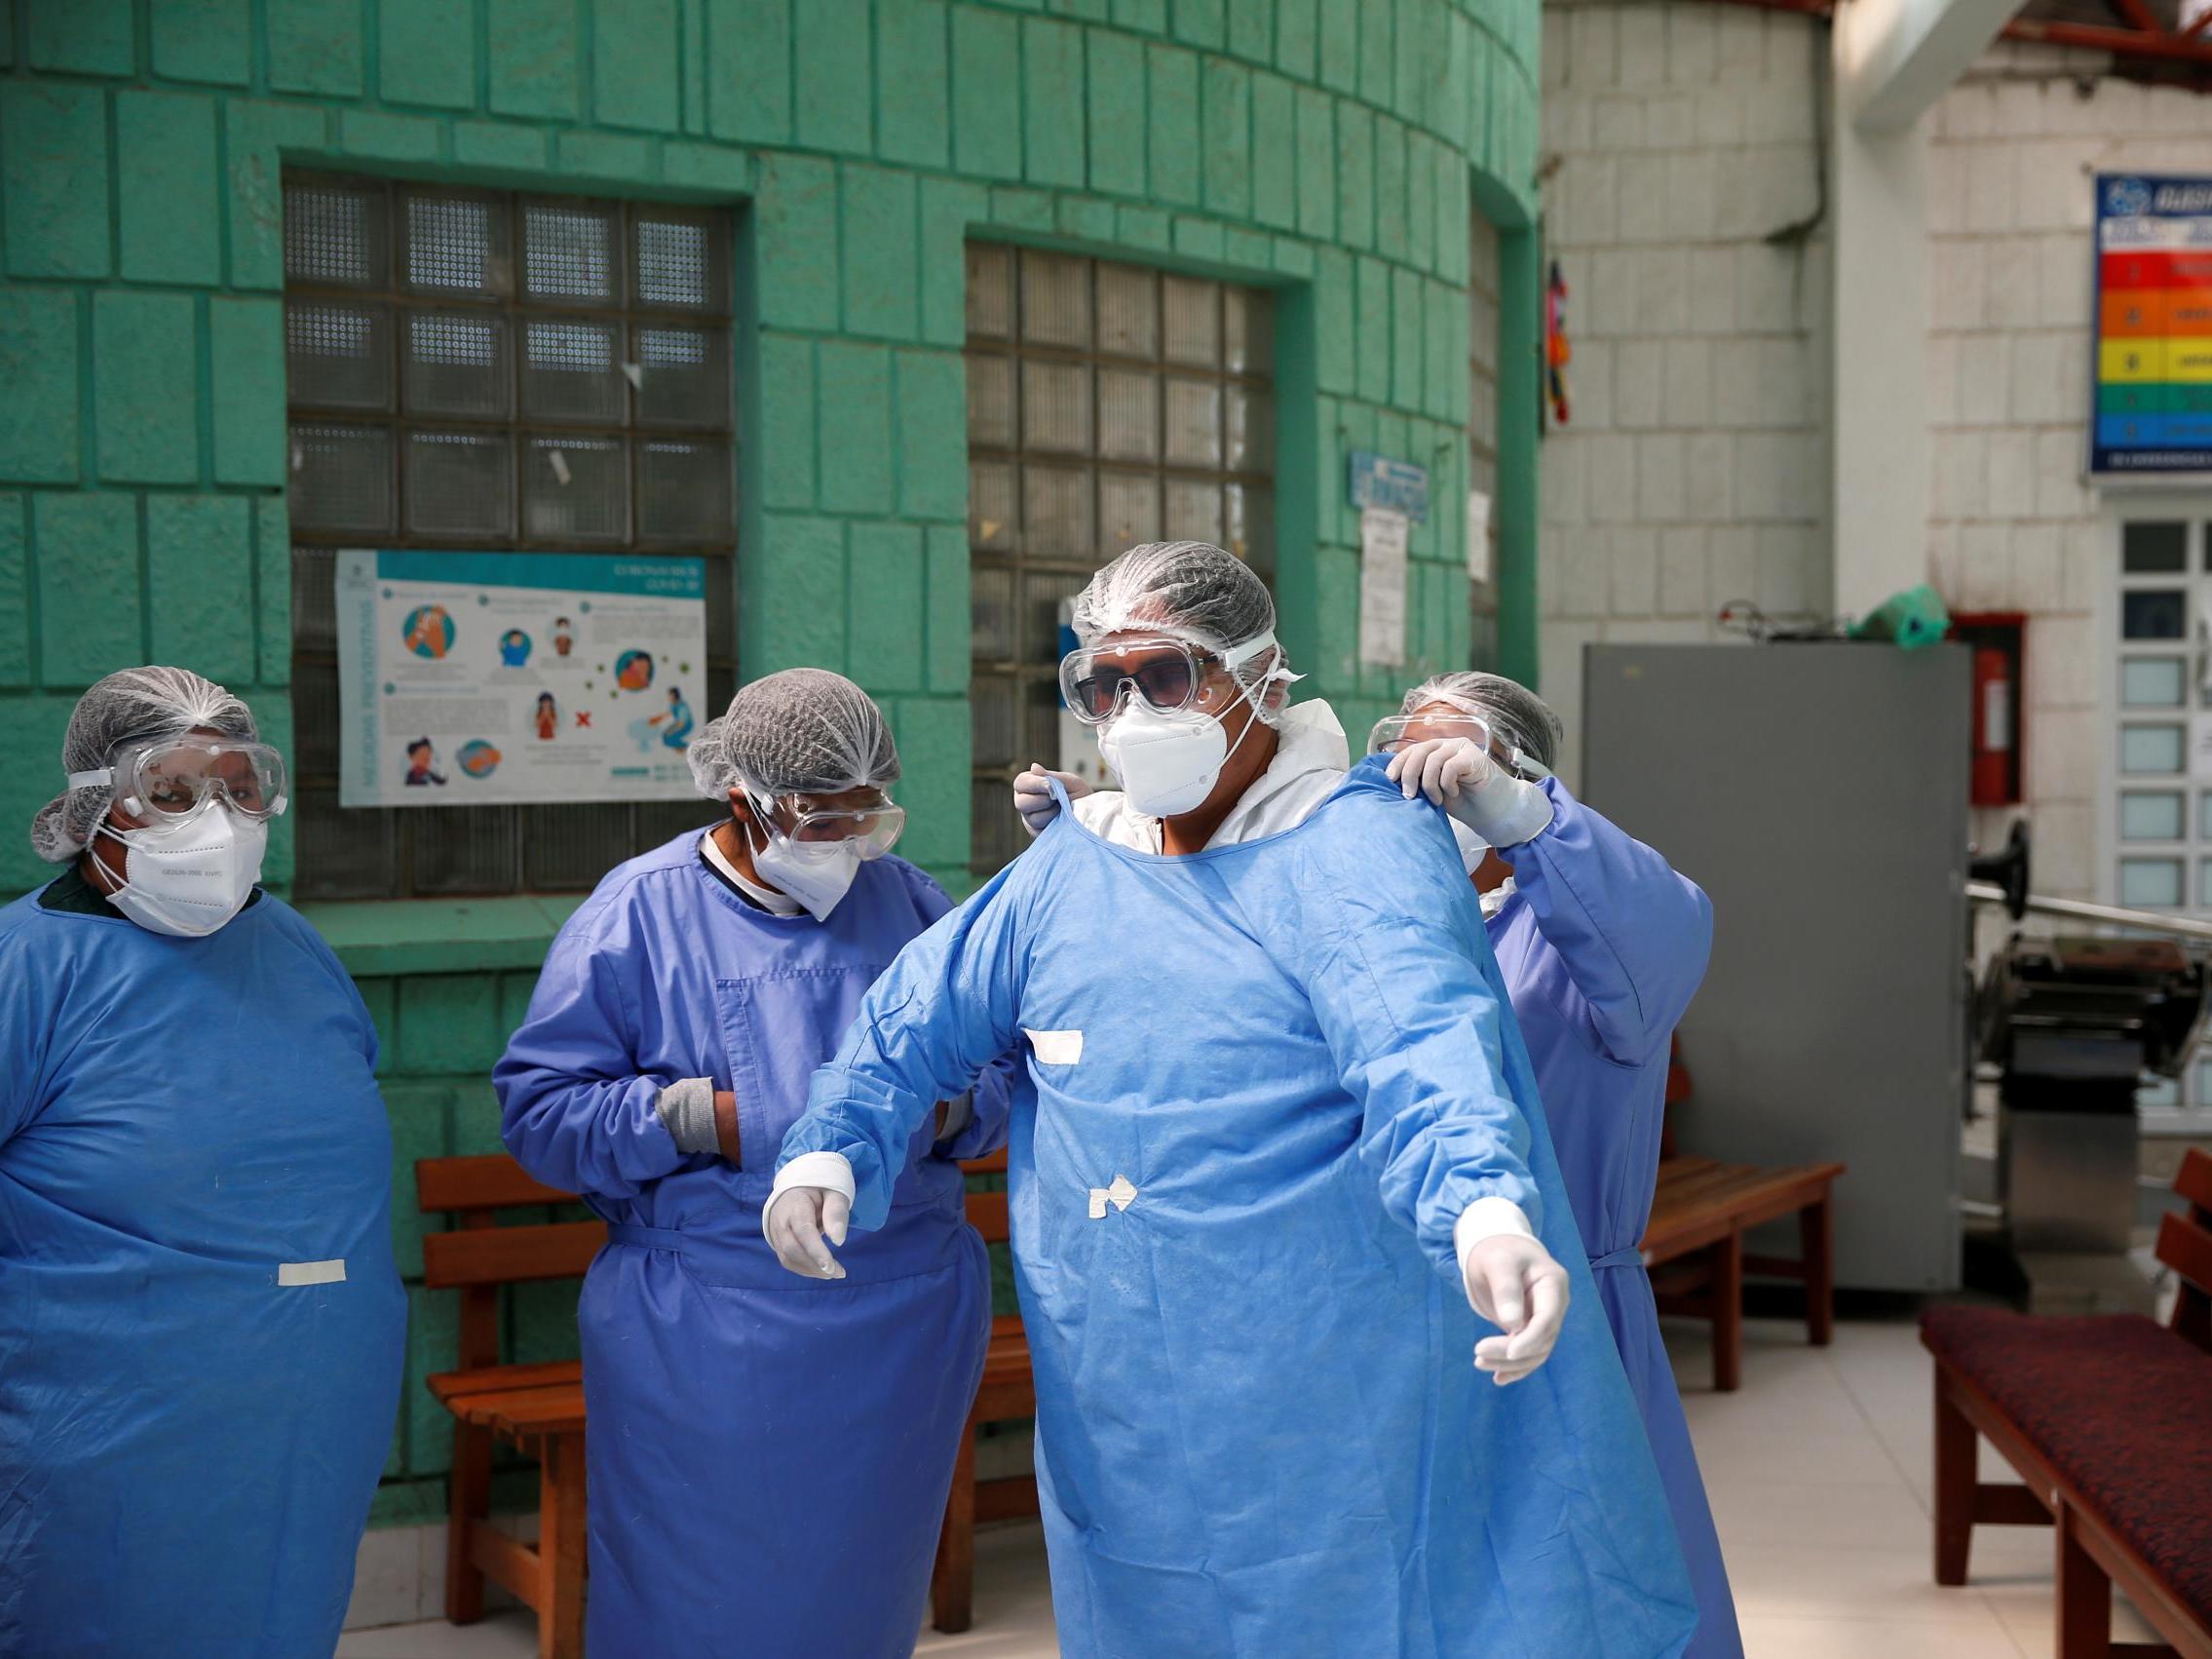 Global coronavirus cases top 12 million